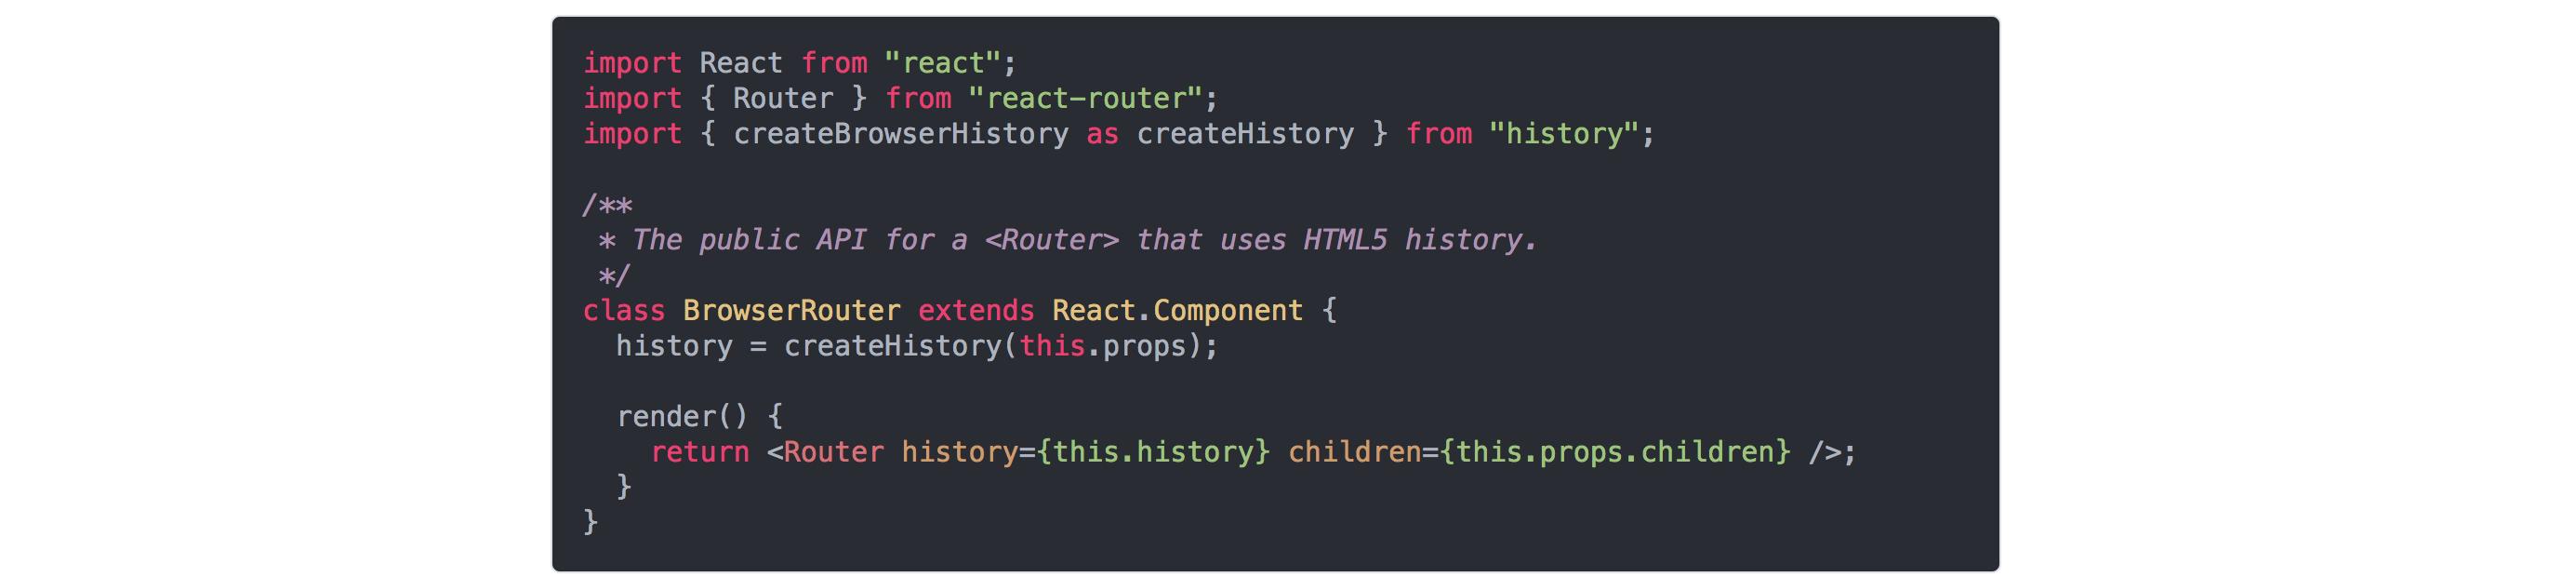 Day07 從 React-router 看 History API